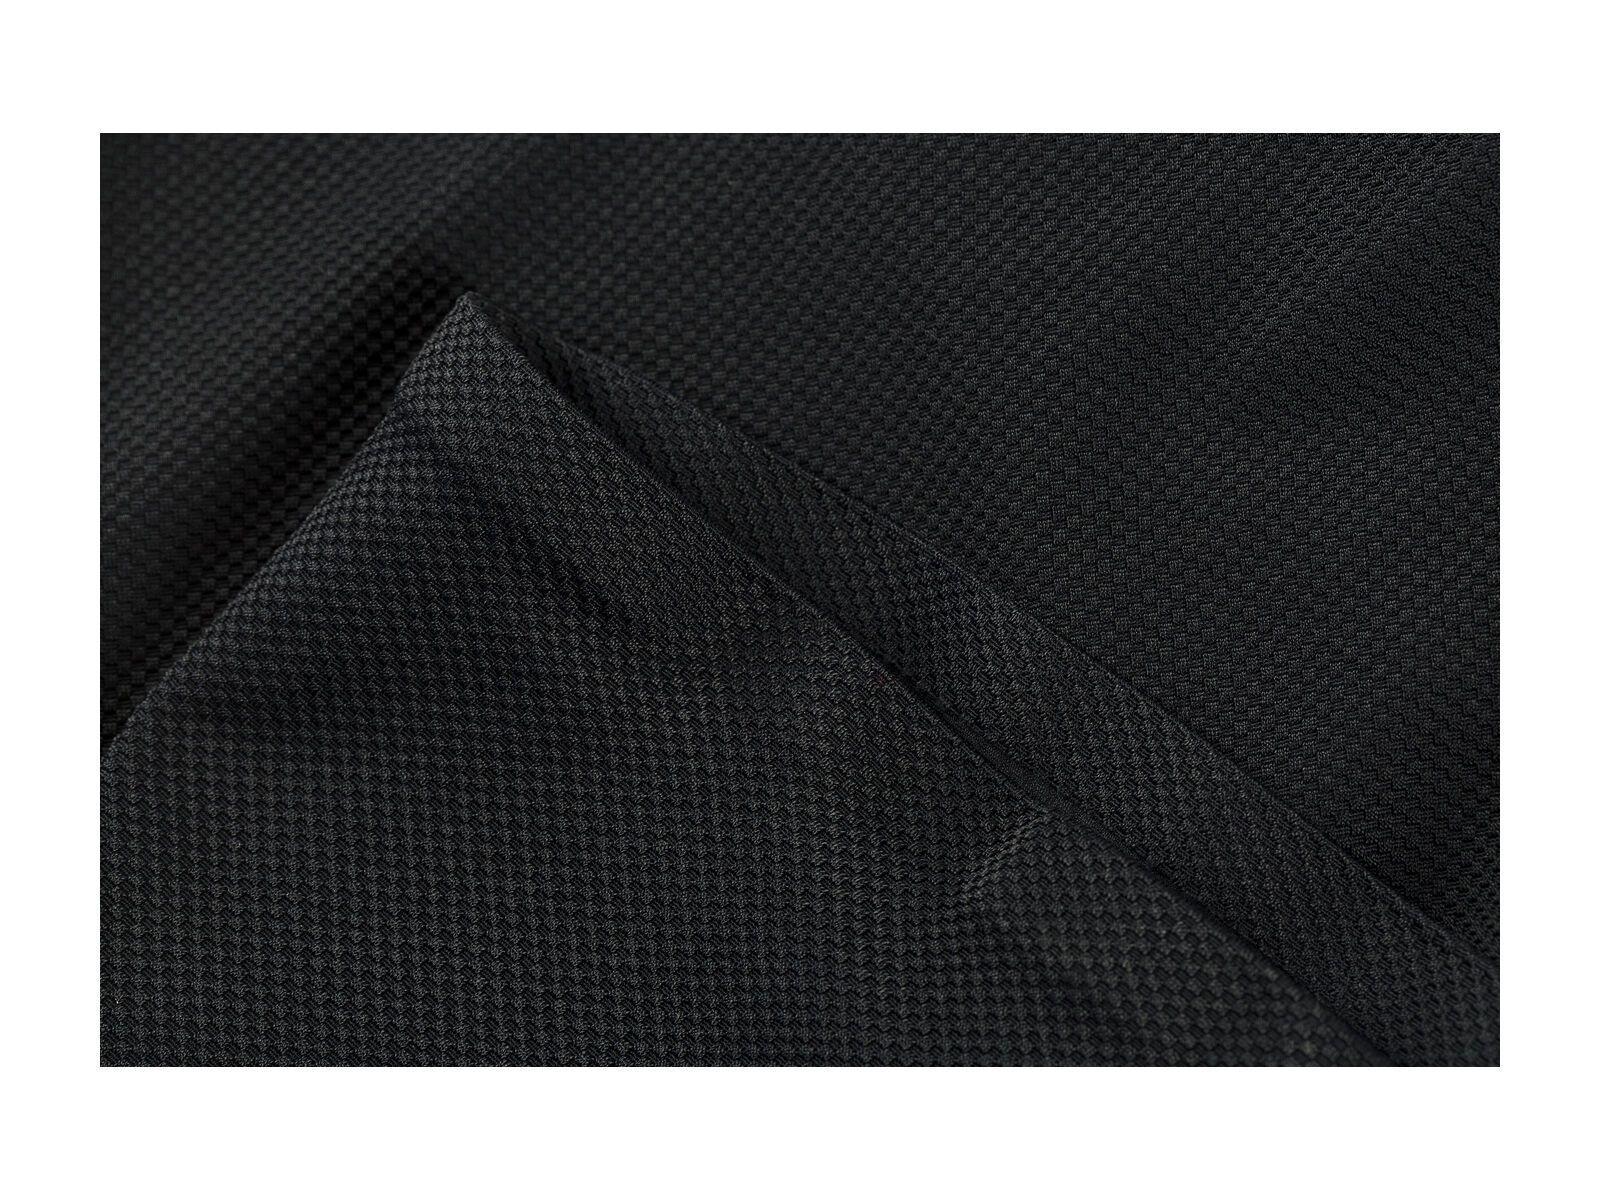 Cube AM Innenhose, black   Bild 5